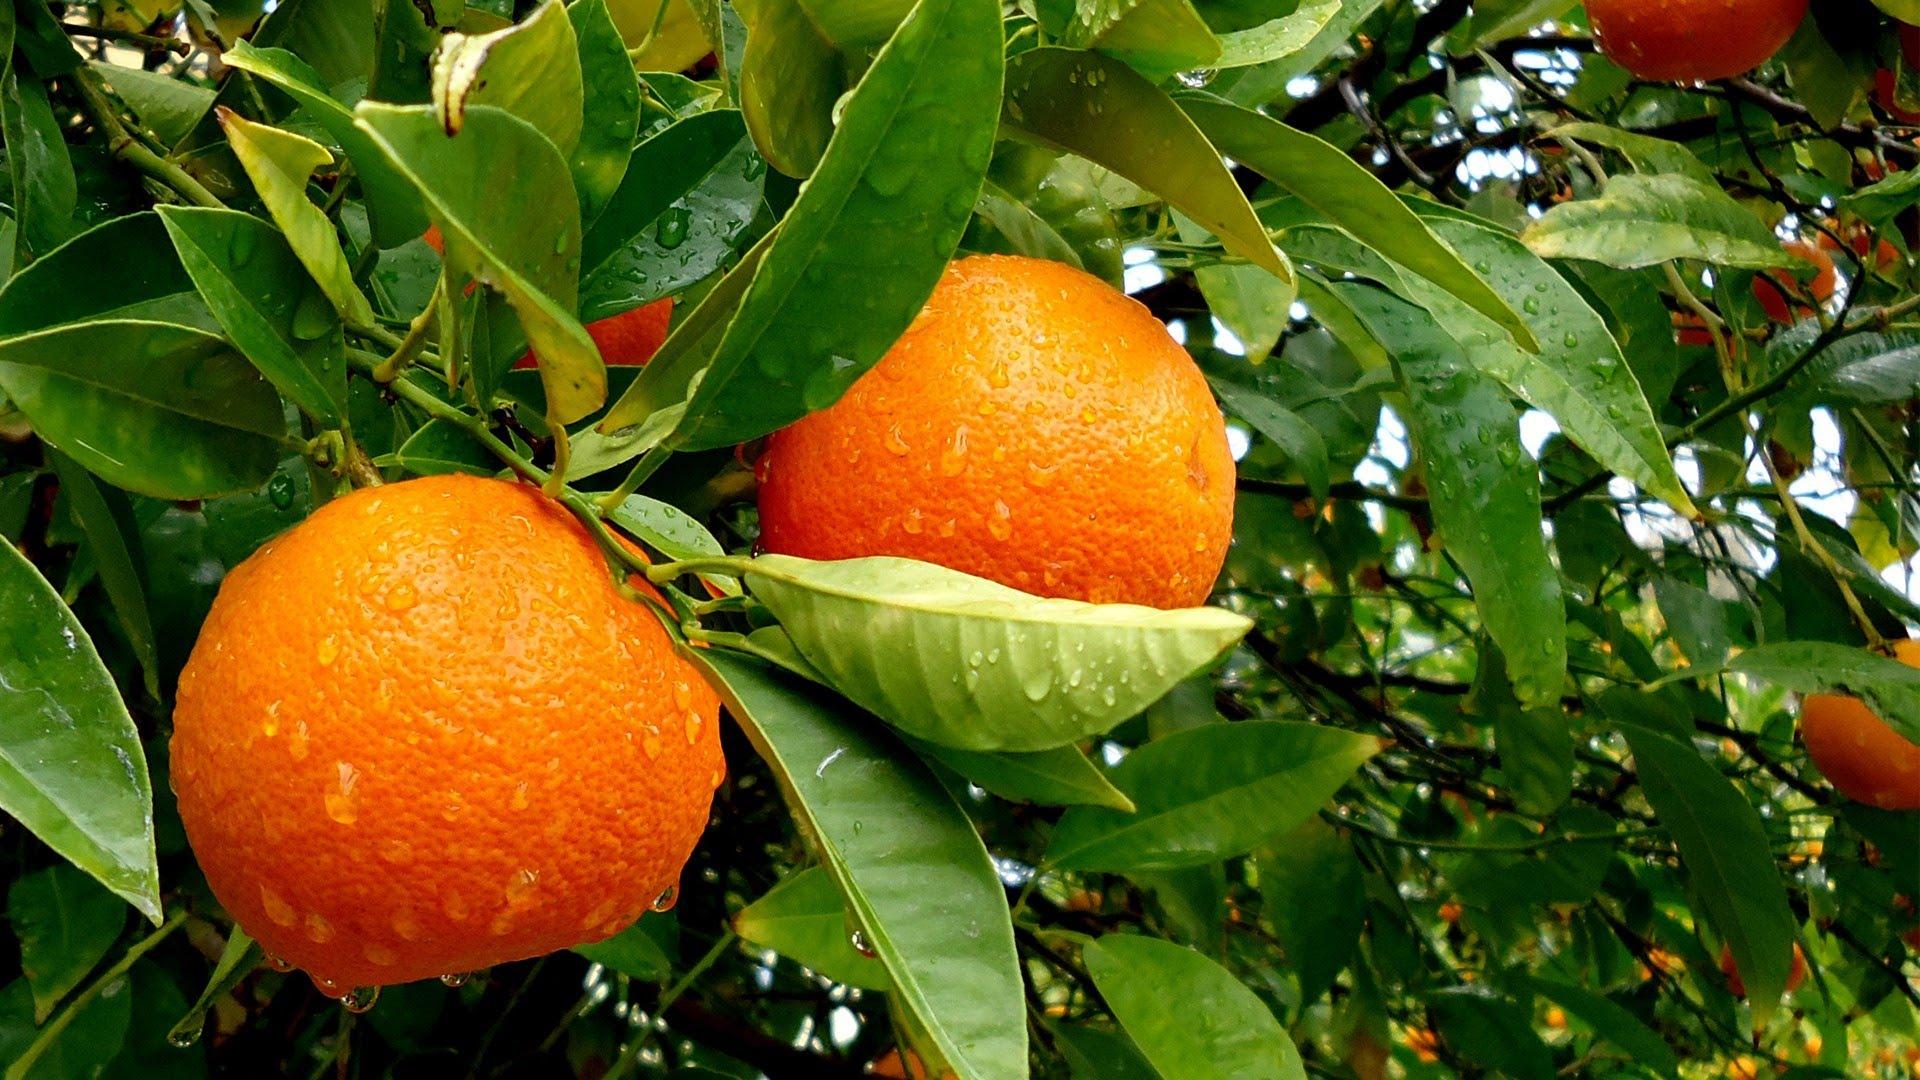 Домашний мандарин из косточки: от А до Я. Уход и выращивание